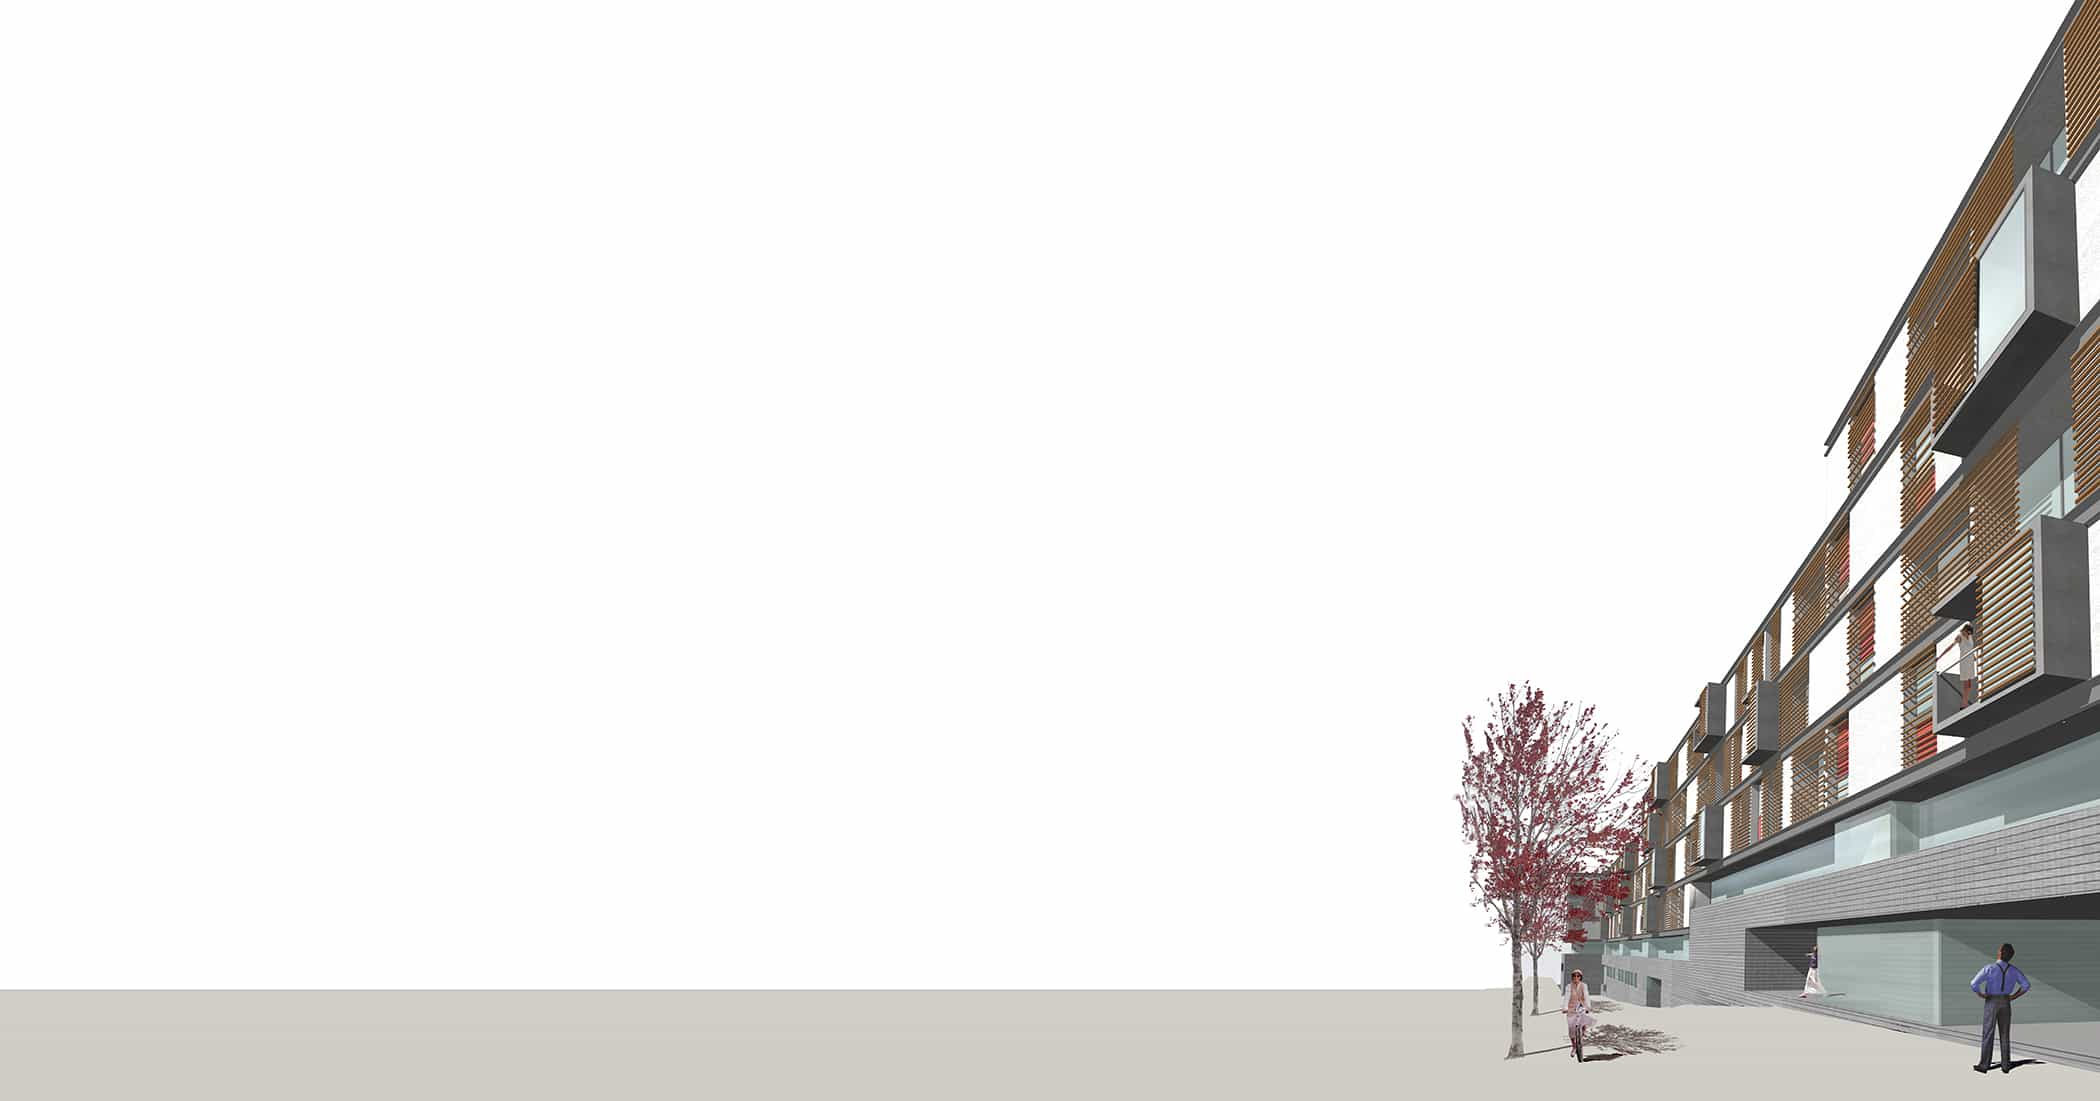 PORTFOLIO arquitectura - viviendas Getafe - LANDINEZ+REY arquitectos [e L2Gaa ]